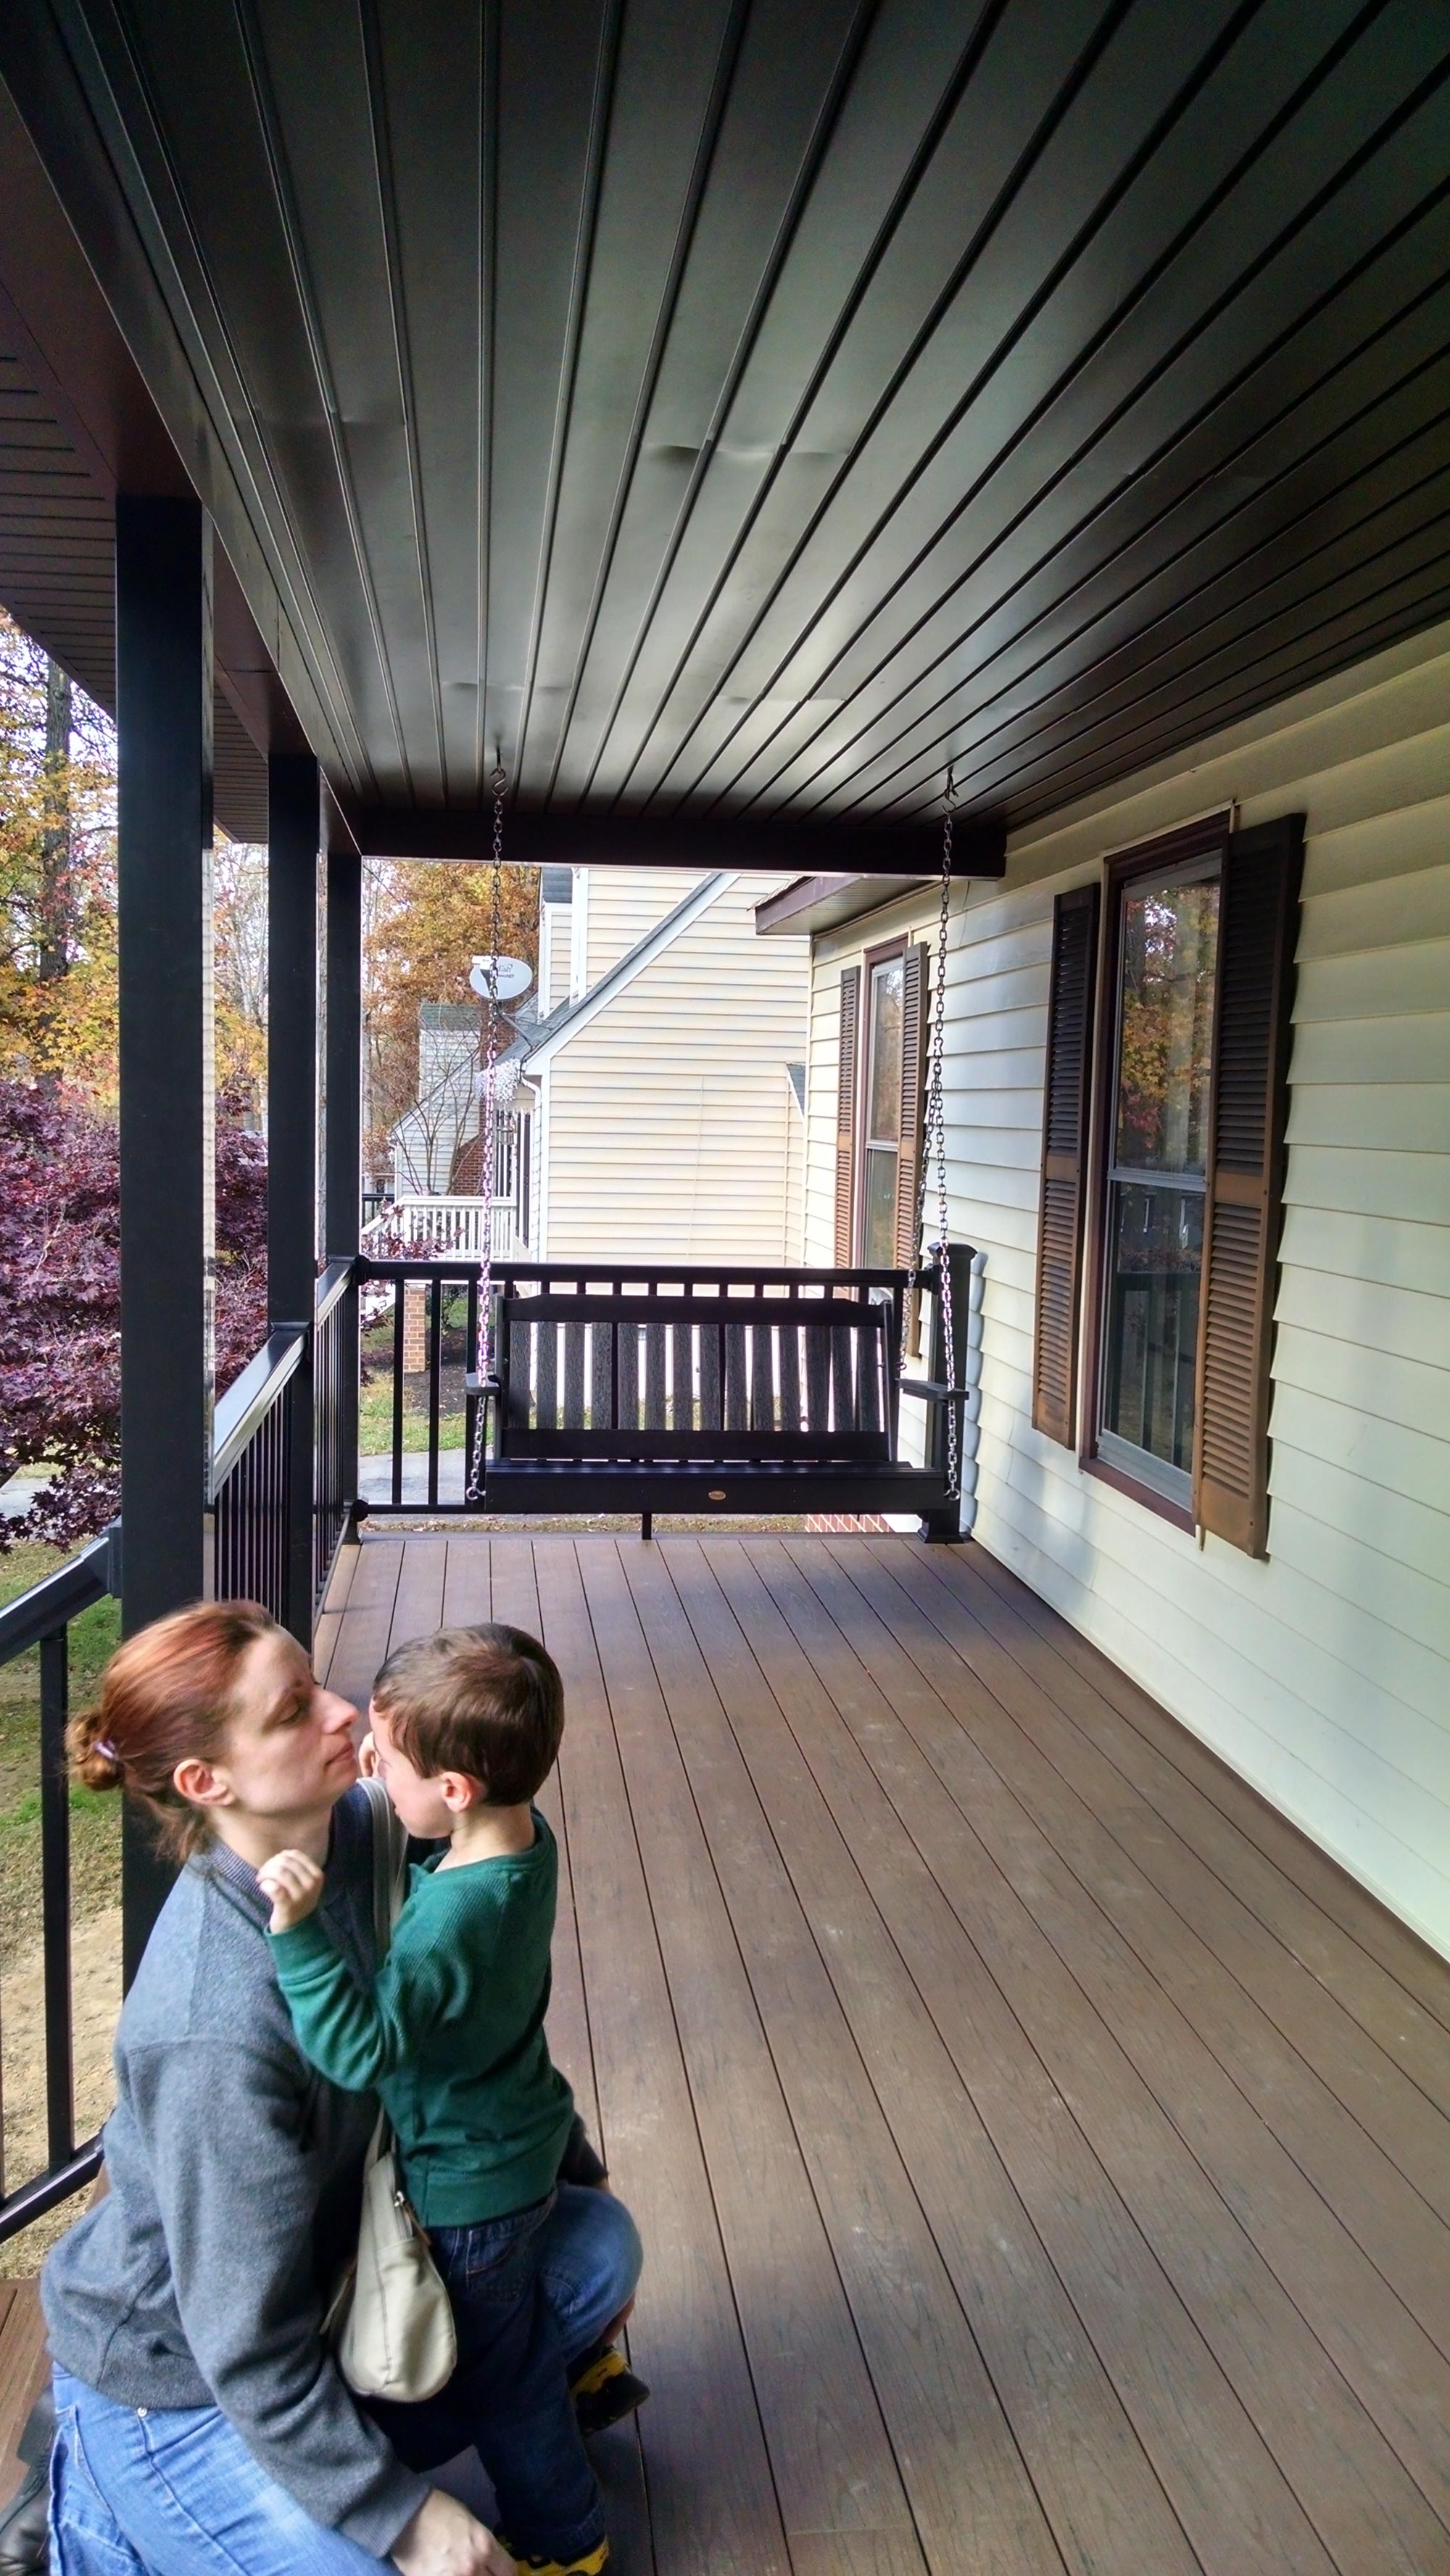 Front Porch Remodel Porch Remodel Front Porch Addition: Front Porch Addition - Chesterfield